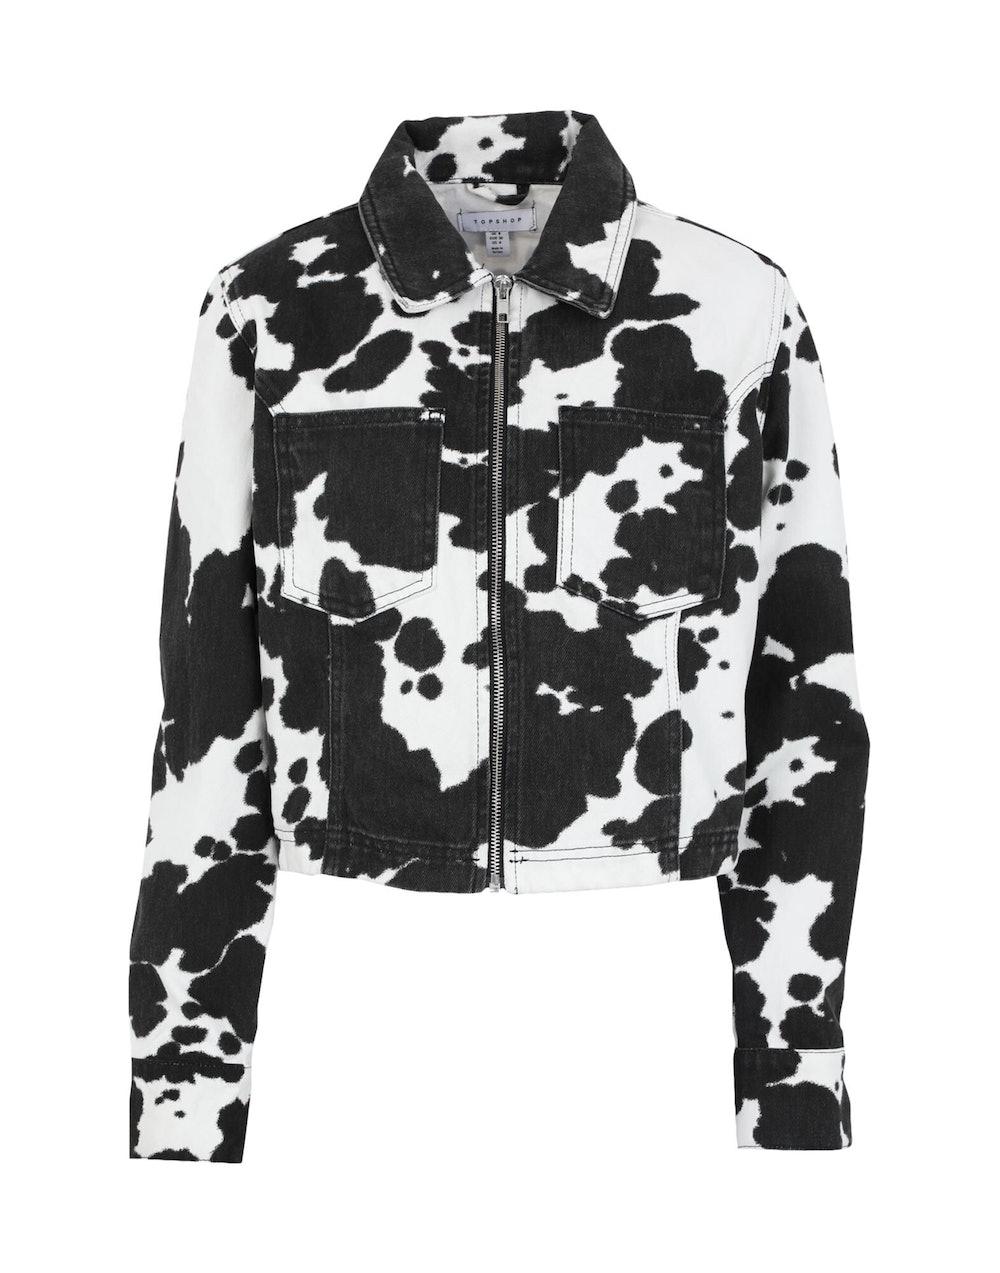 CONSIDERED COW PRINT DENIM JACKET